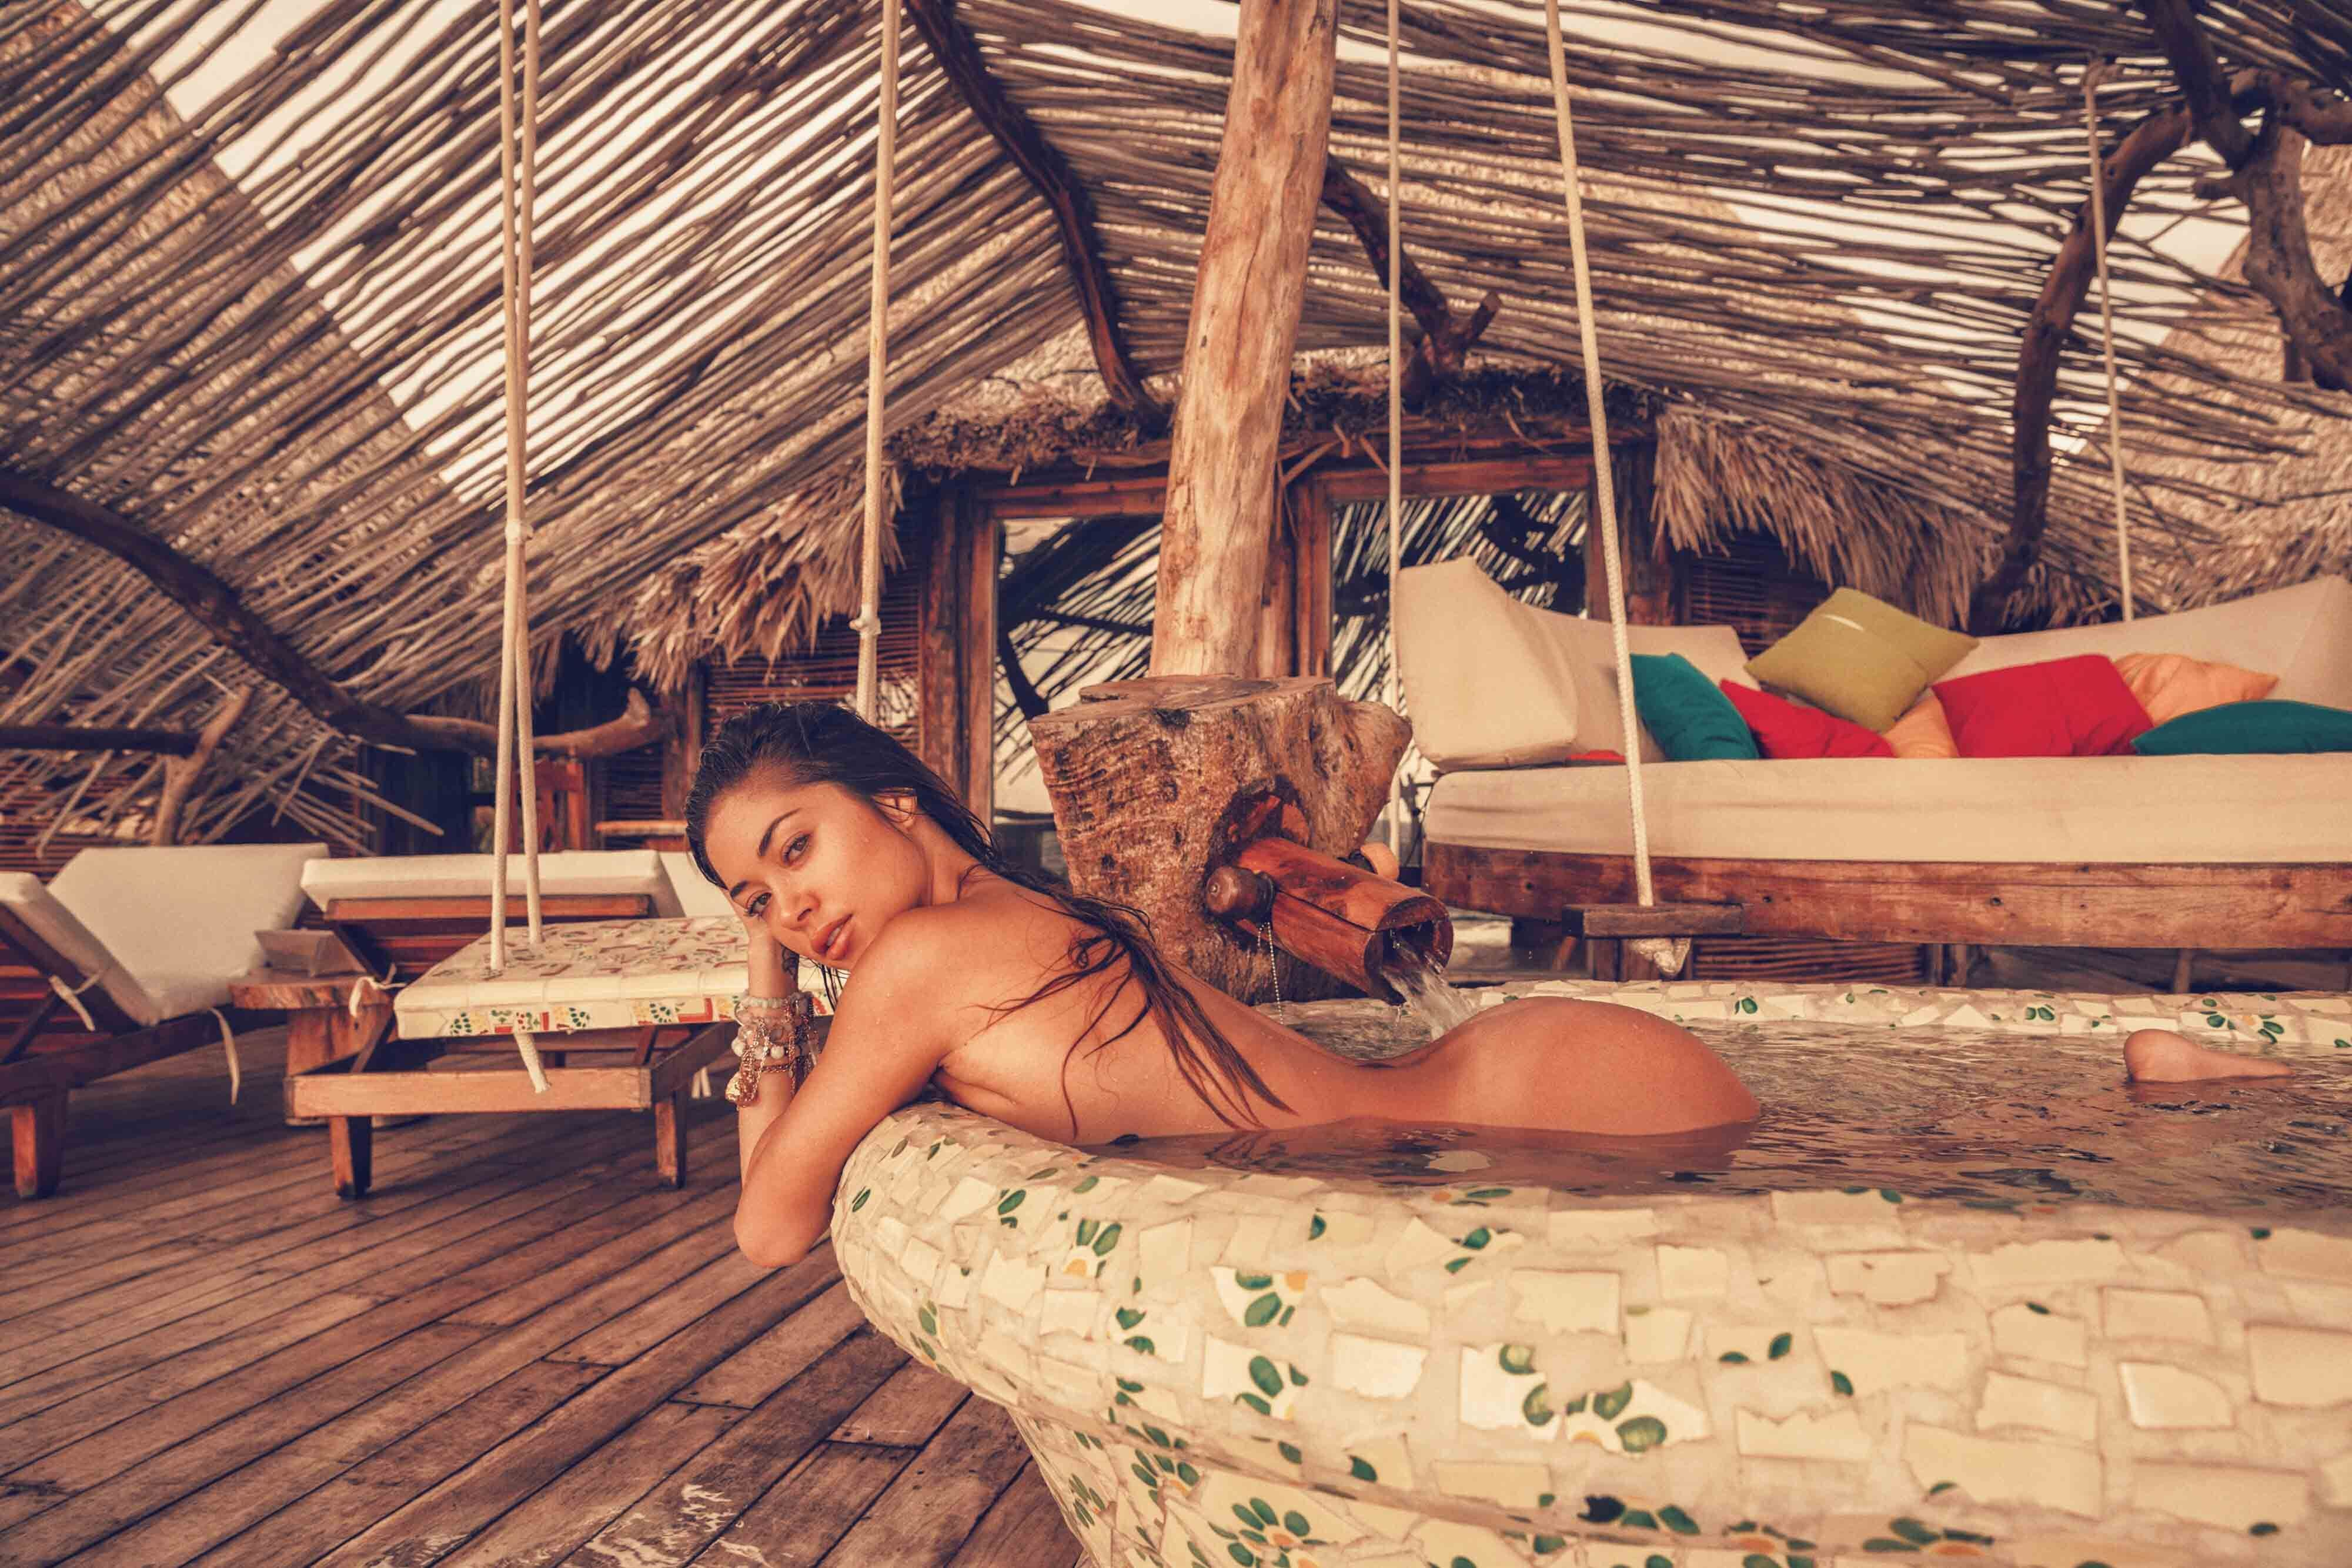 TheFappening Arianny Celeste nude photos 2019